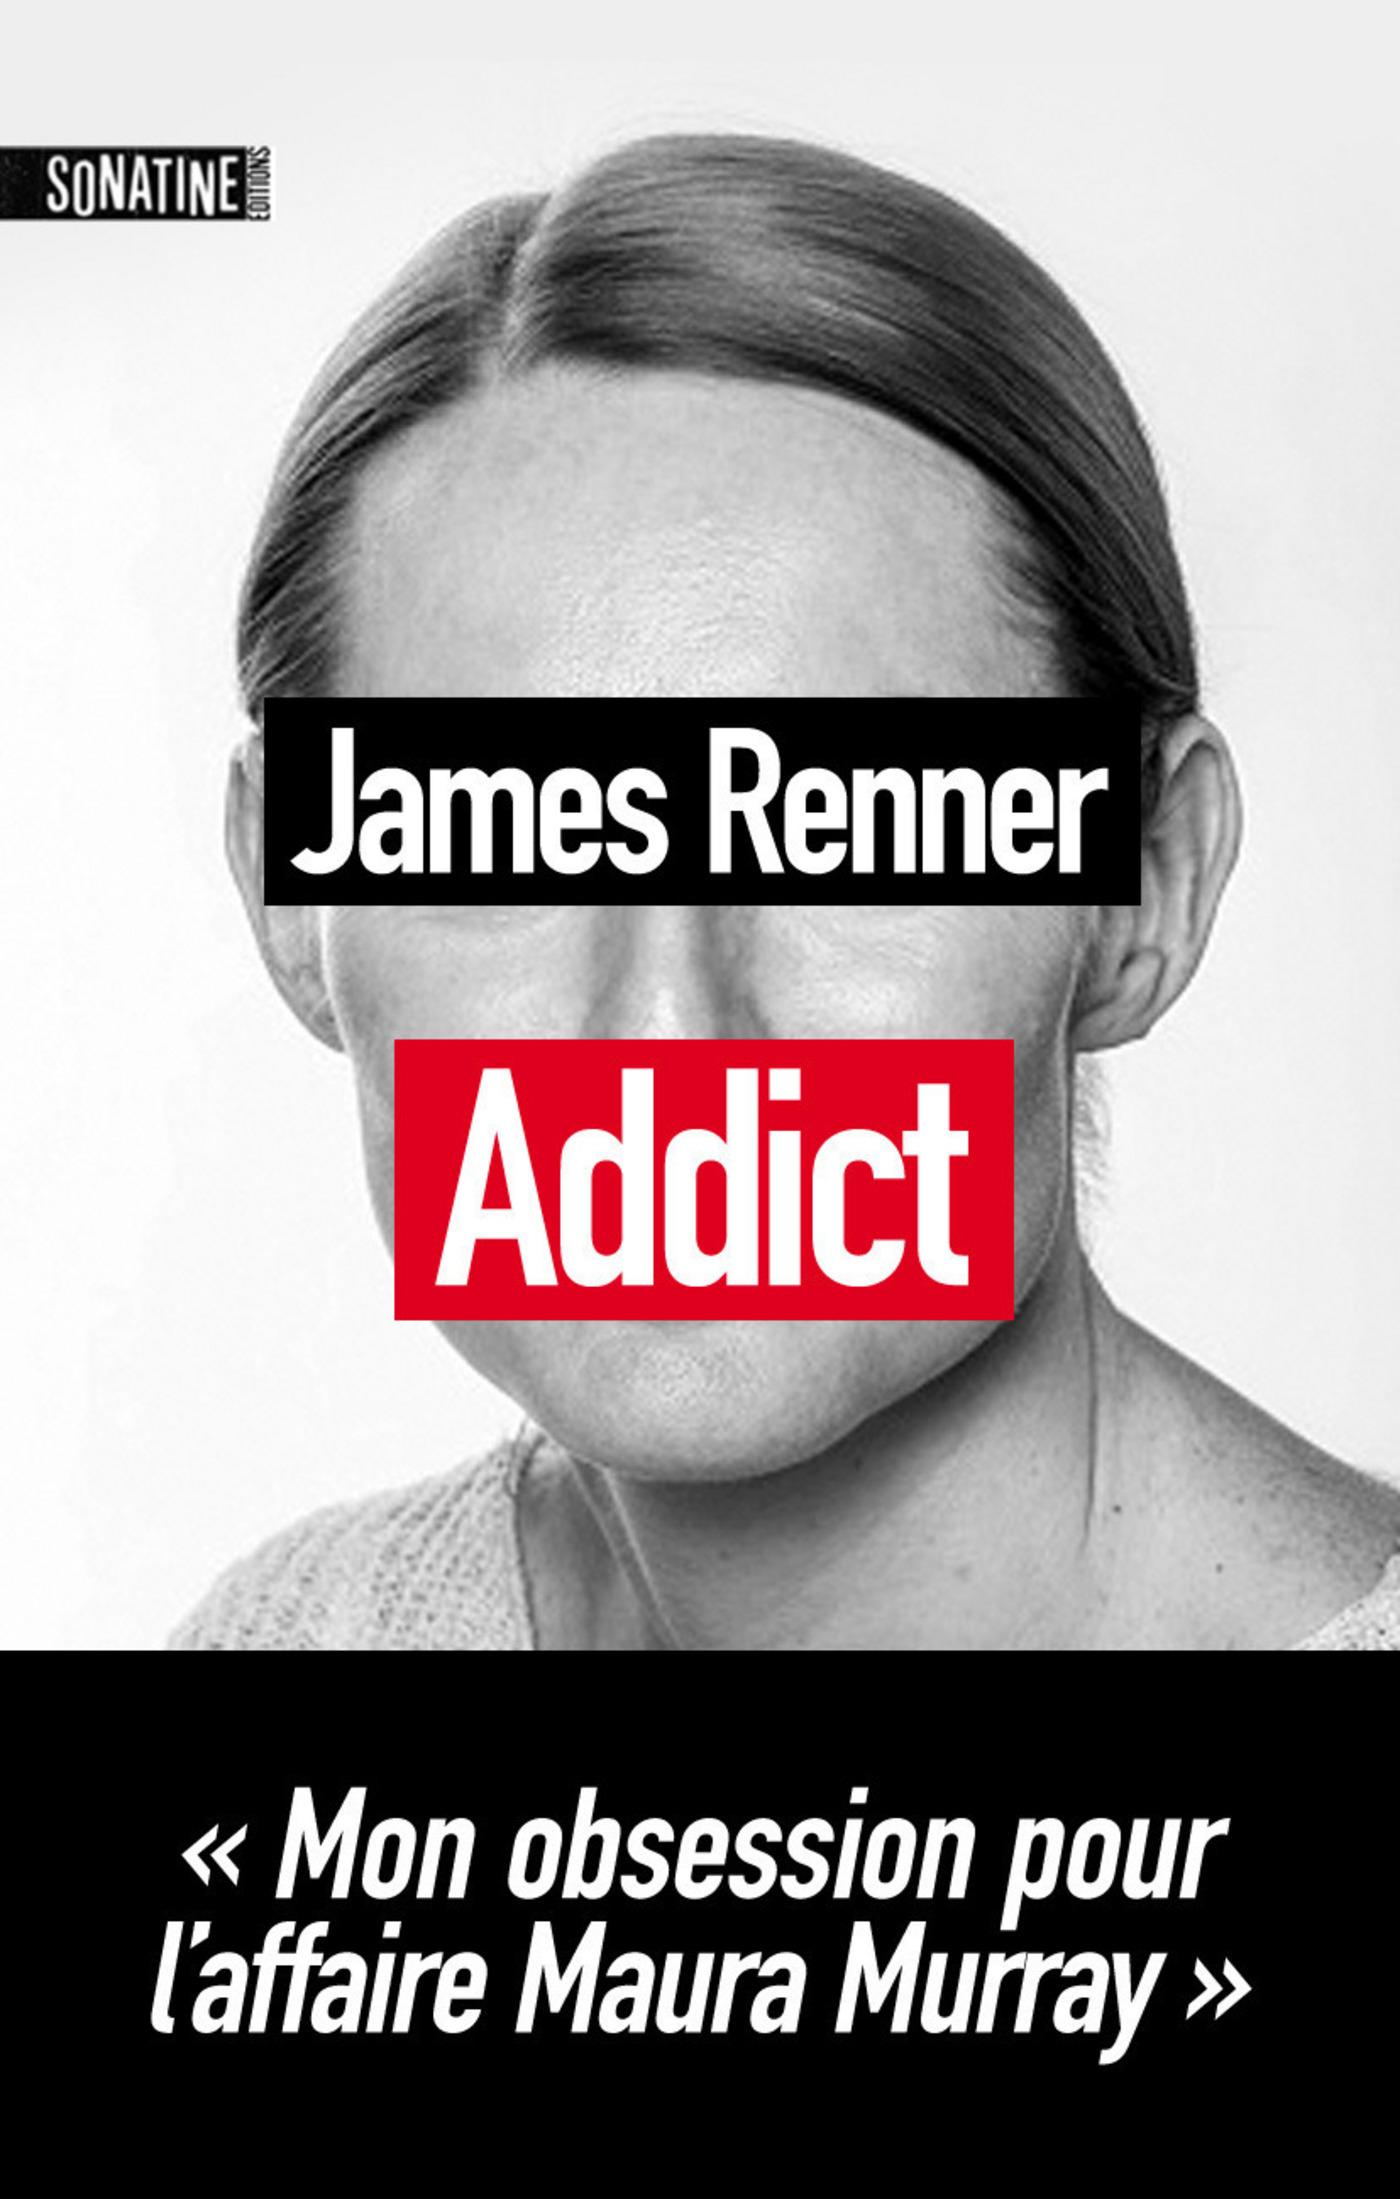 Addict, MON OBSESSION POUR L'AFFAIRE MAURA MURRAY